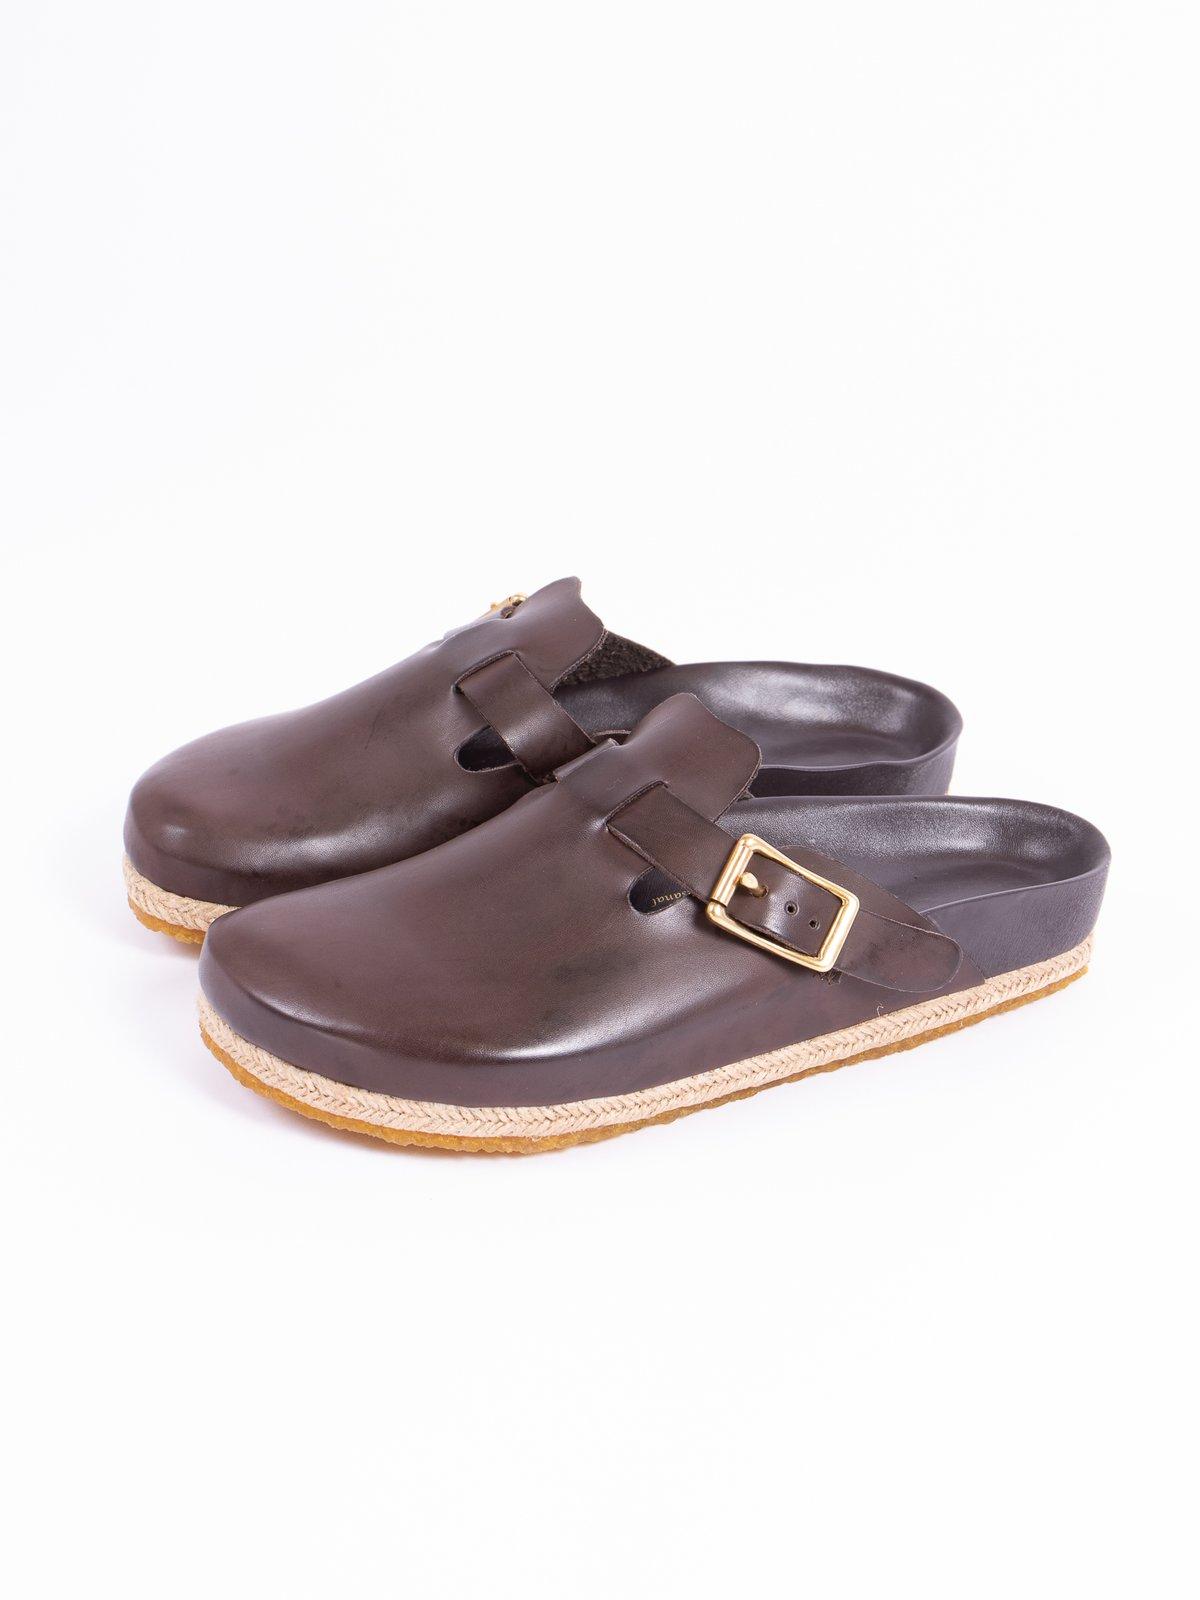 Brown Bostonian Sandal - Image 2